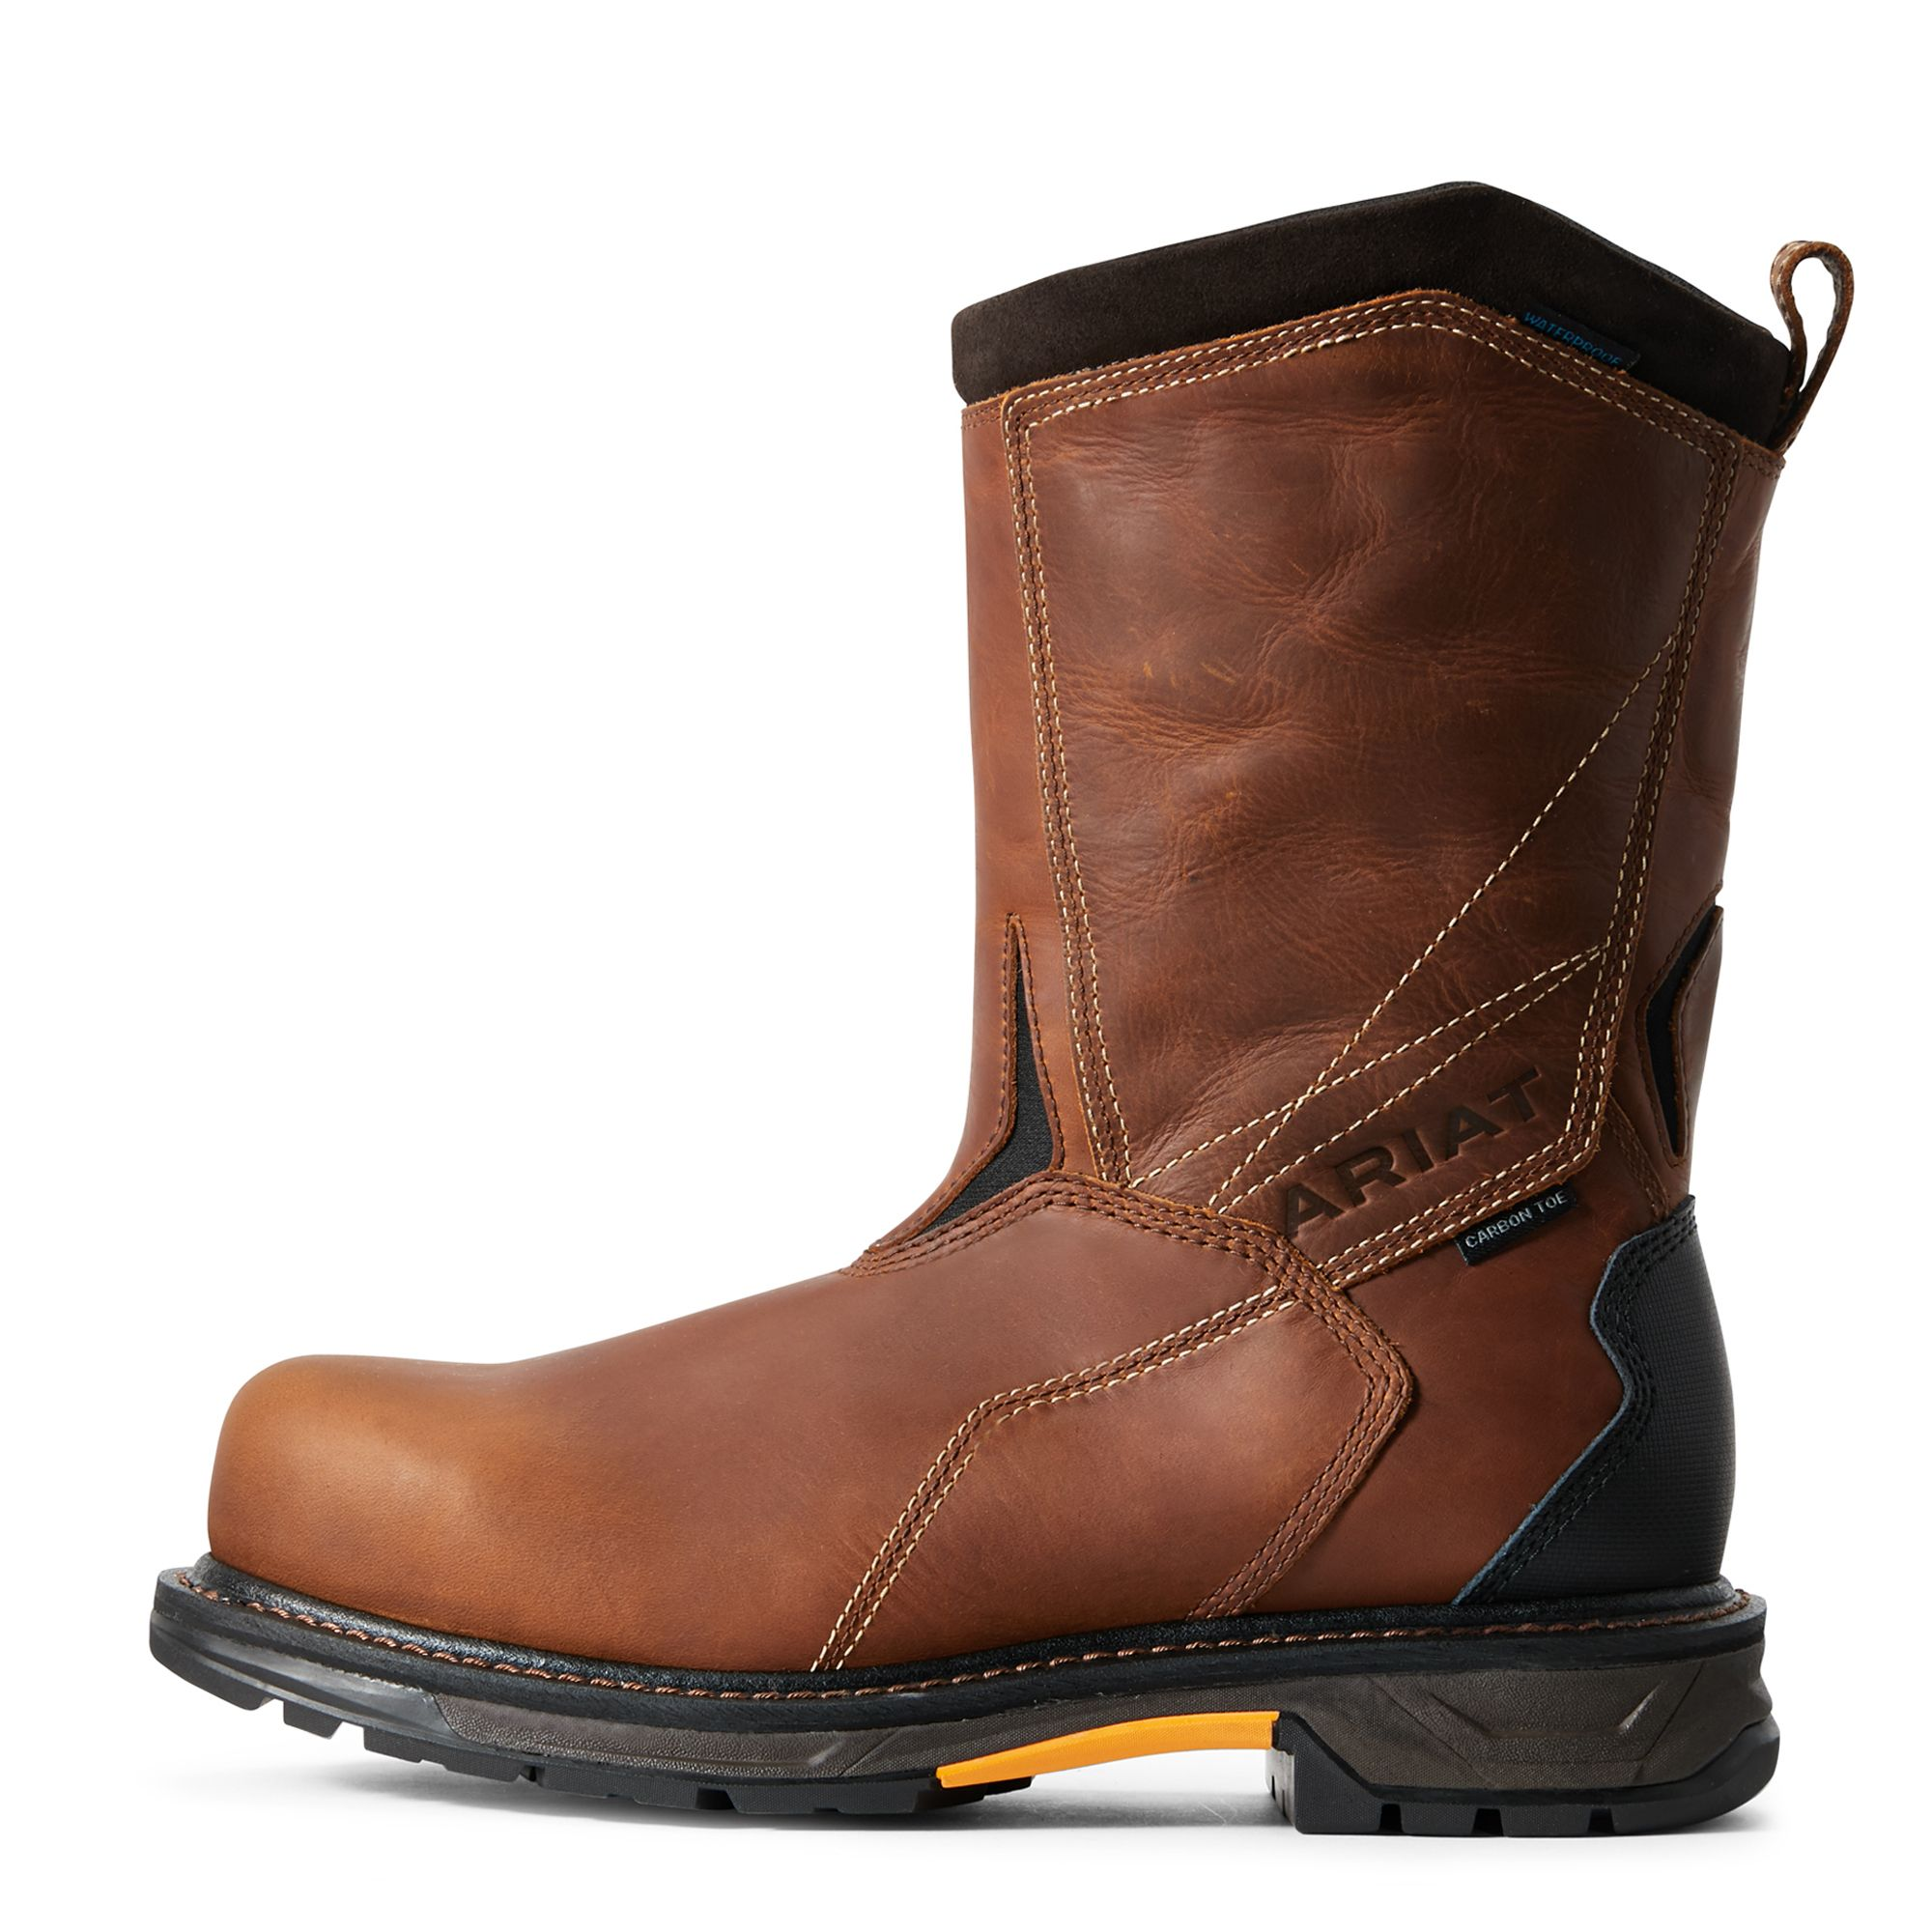 WorkHog XT Defy Waterproof Carbon Toe Work Boot Boots